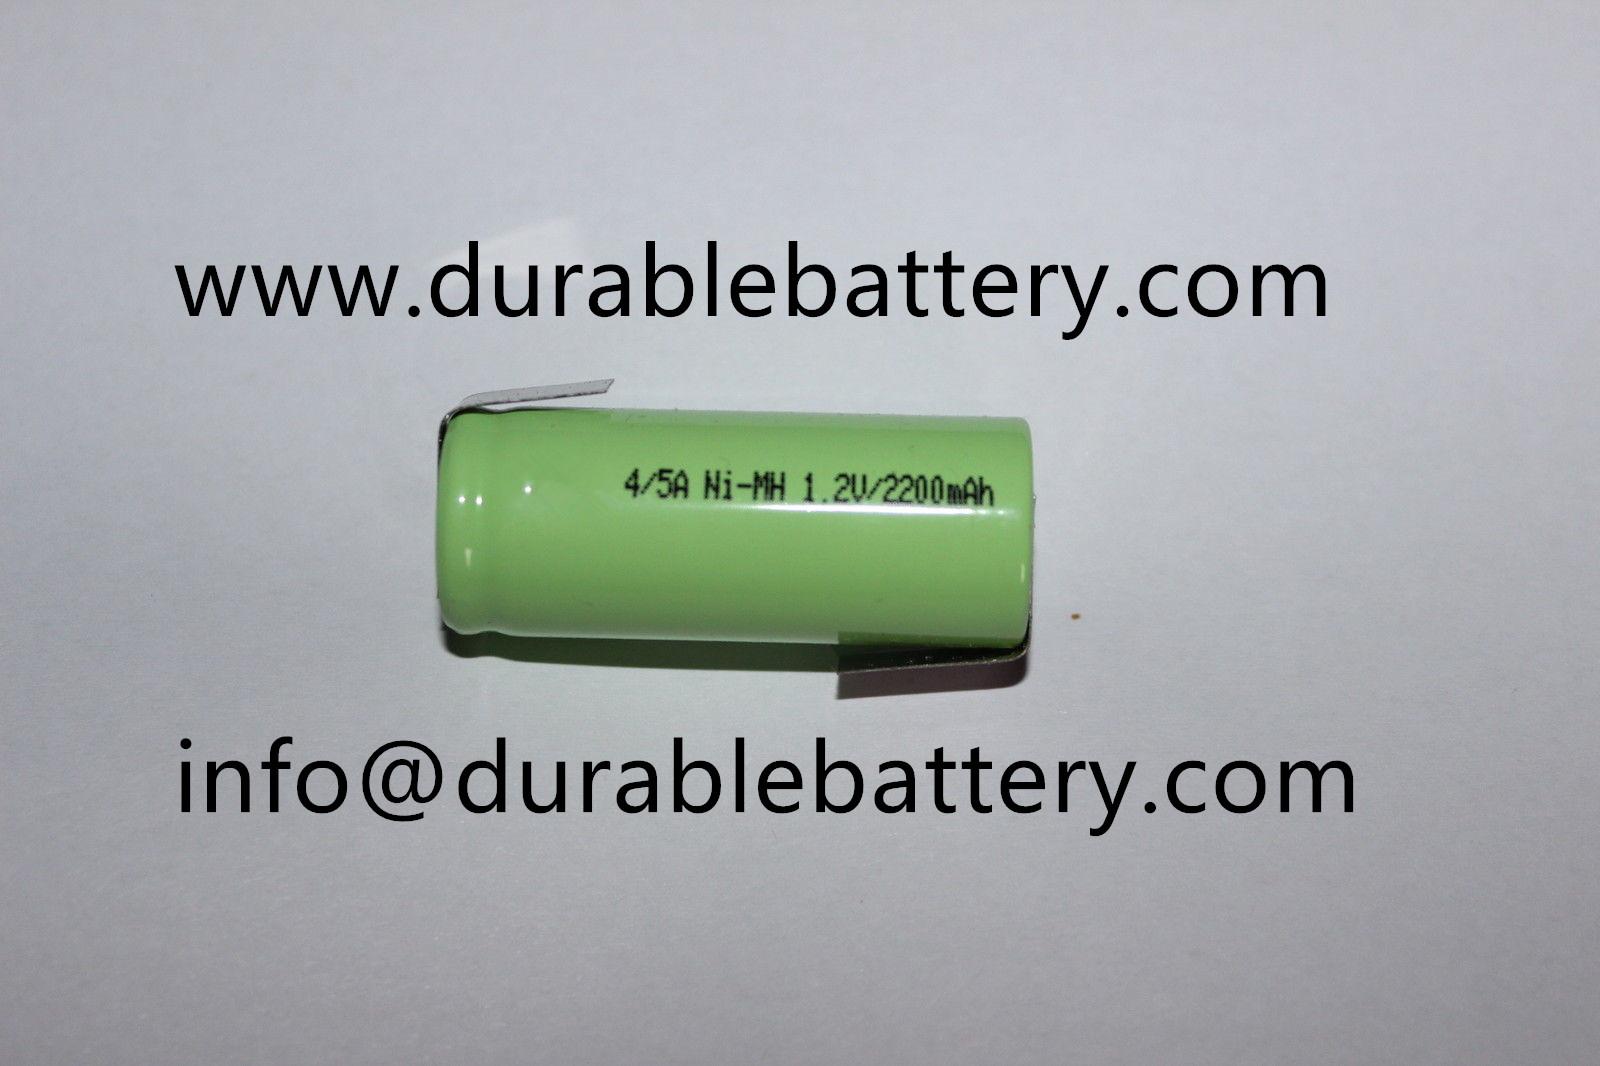 4/5A NiMH rechargable battery 1.2V 1800mah 2000mAh NiMH Battery for GPS, RC toys